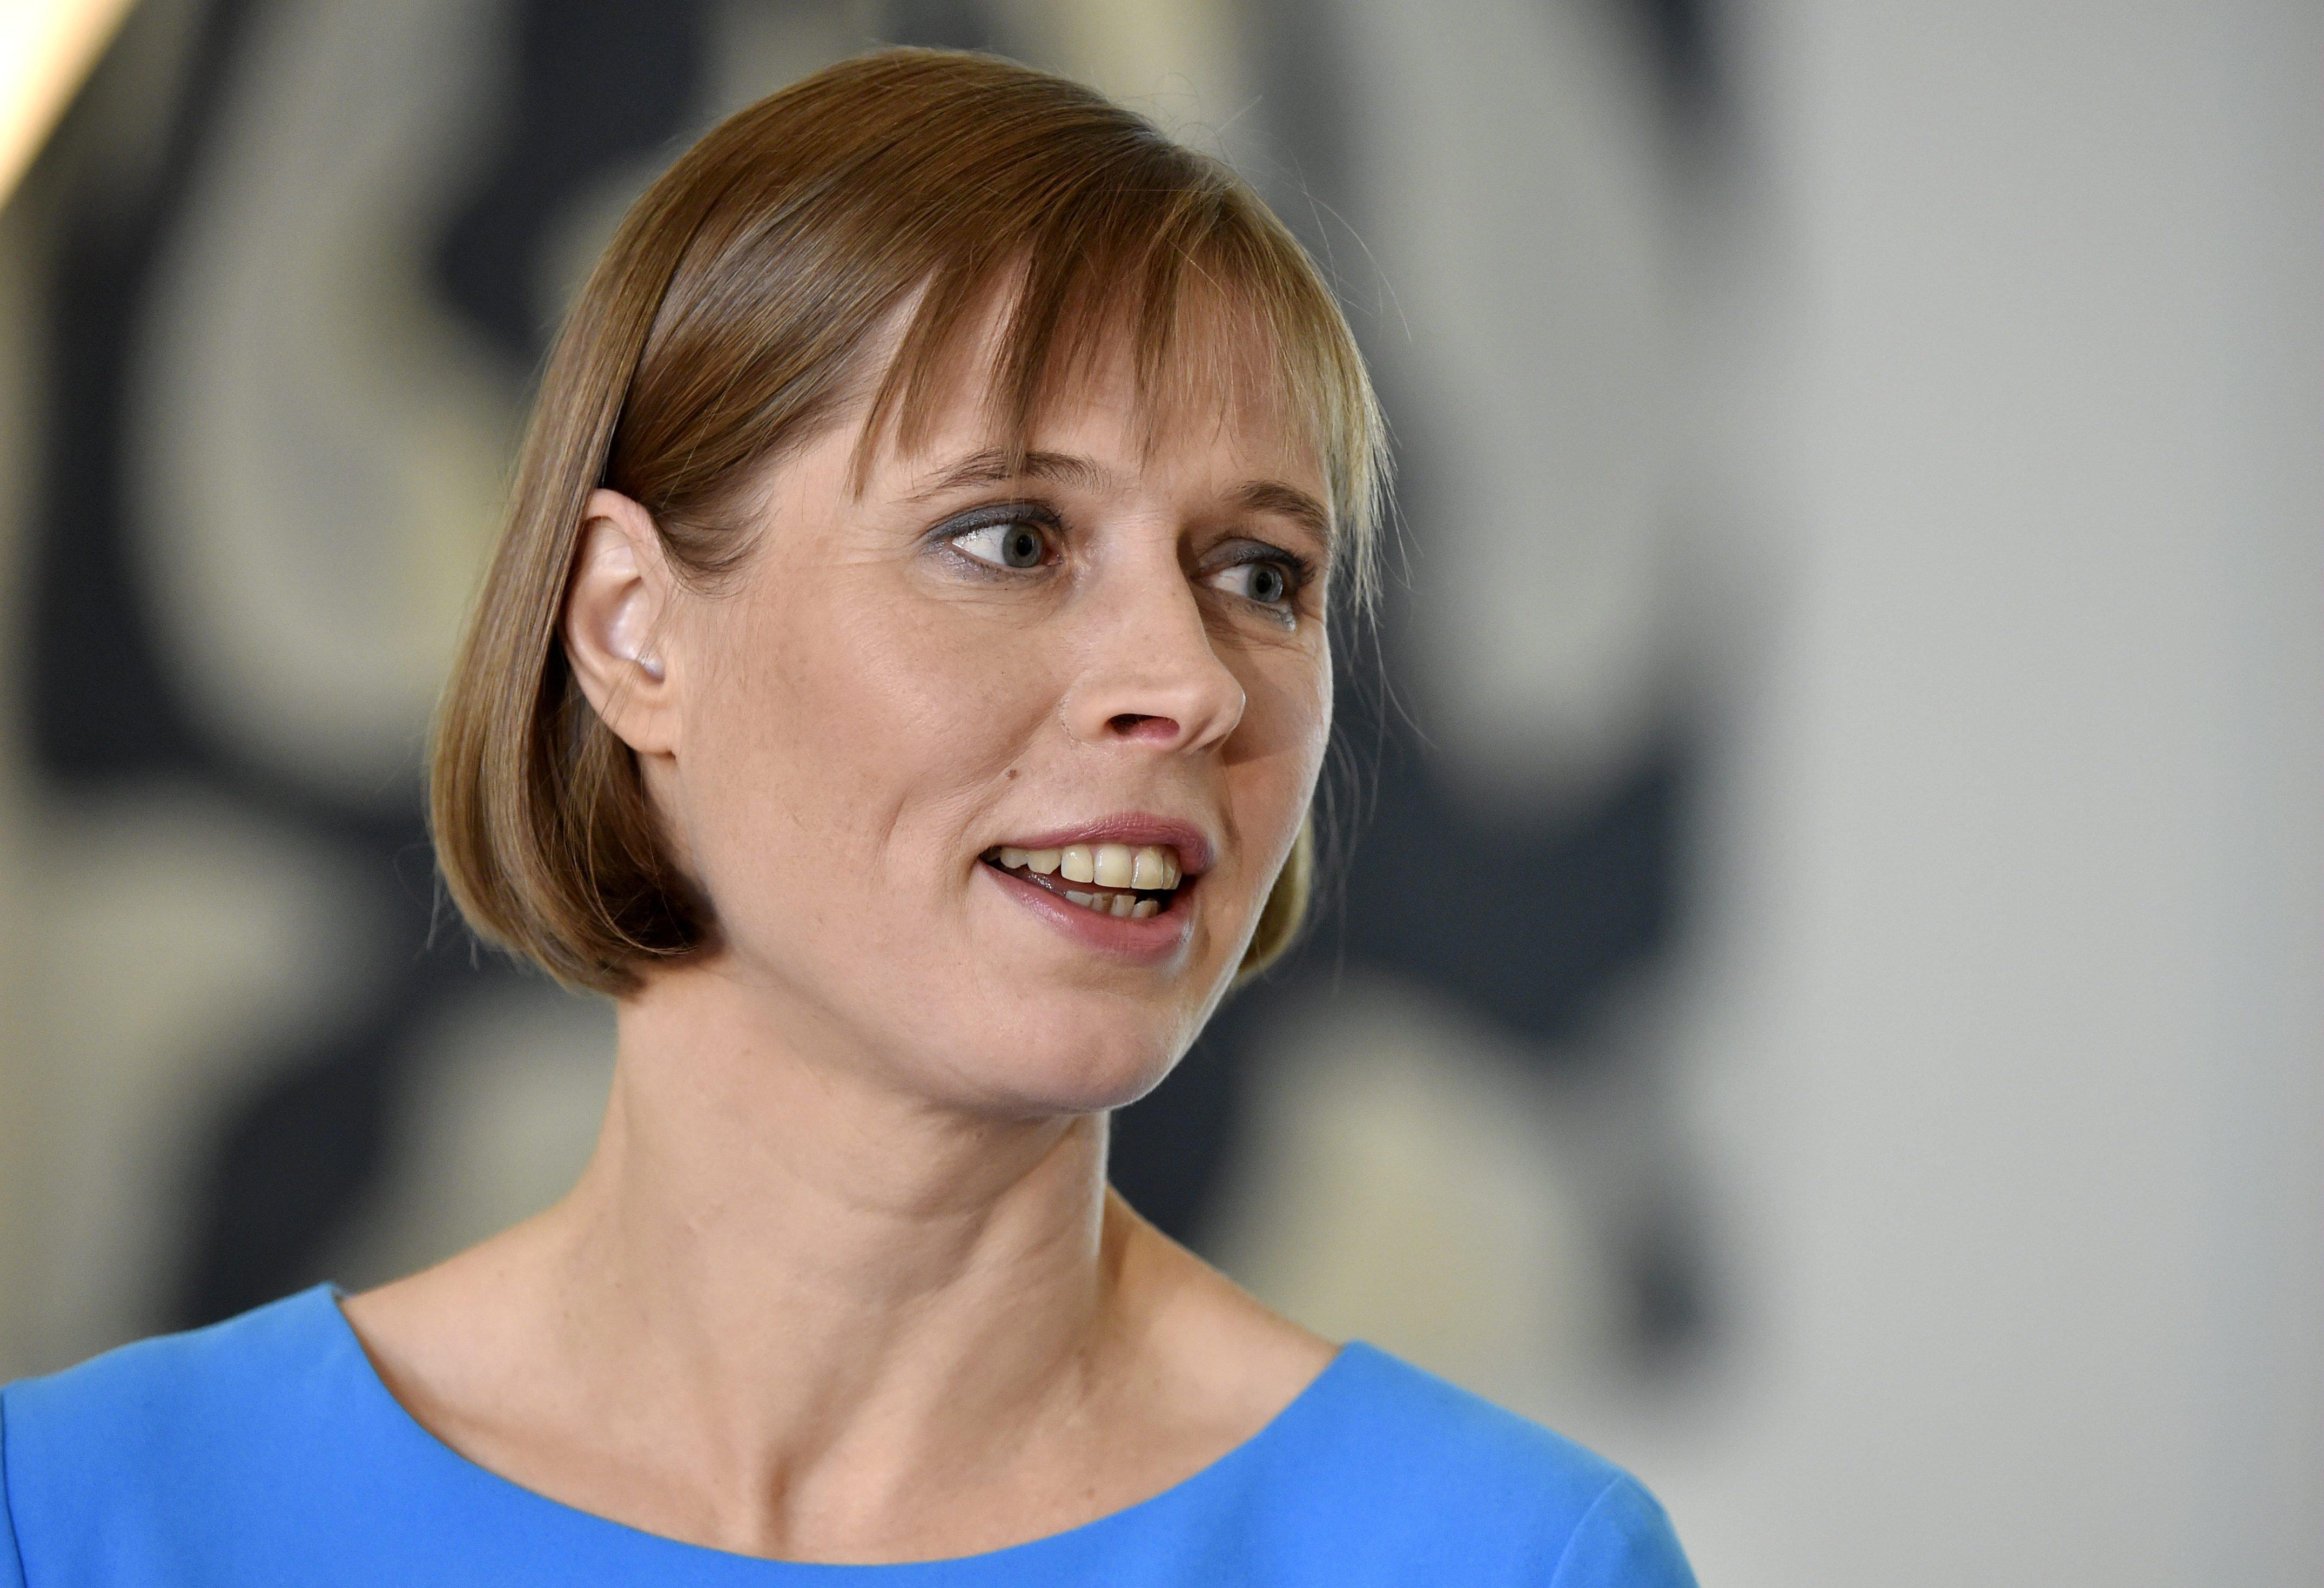 Kersti Kaljulaid: Η Πρόεδρος της Εσθονίας συζητά για την ψηφιοποίηση της Οικονομίας και την ηλεκτρονική